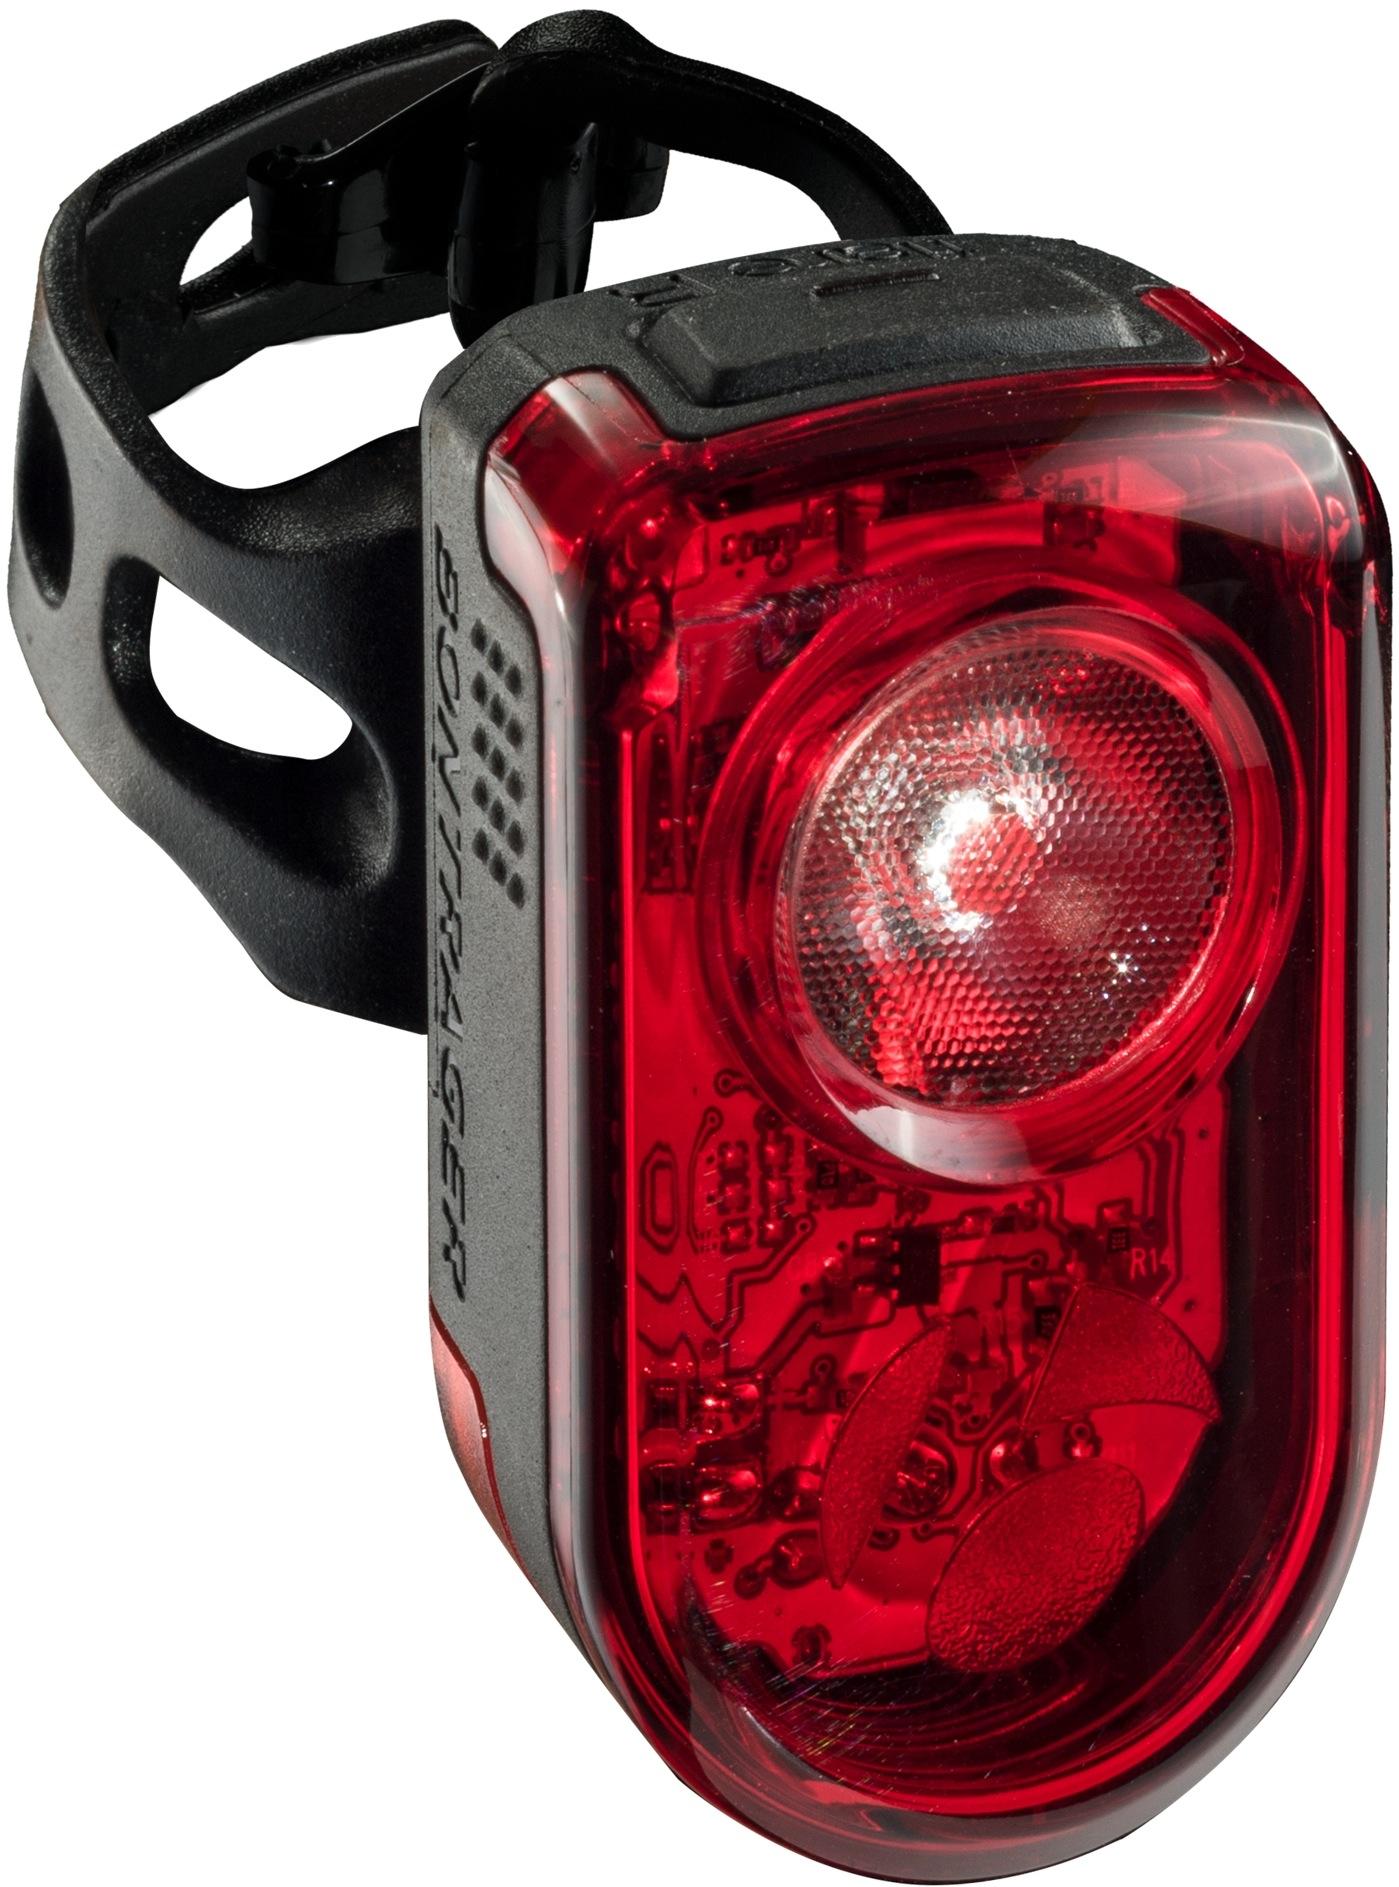 Bontrager Flare R Rear Bike Light Lights Accessories